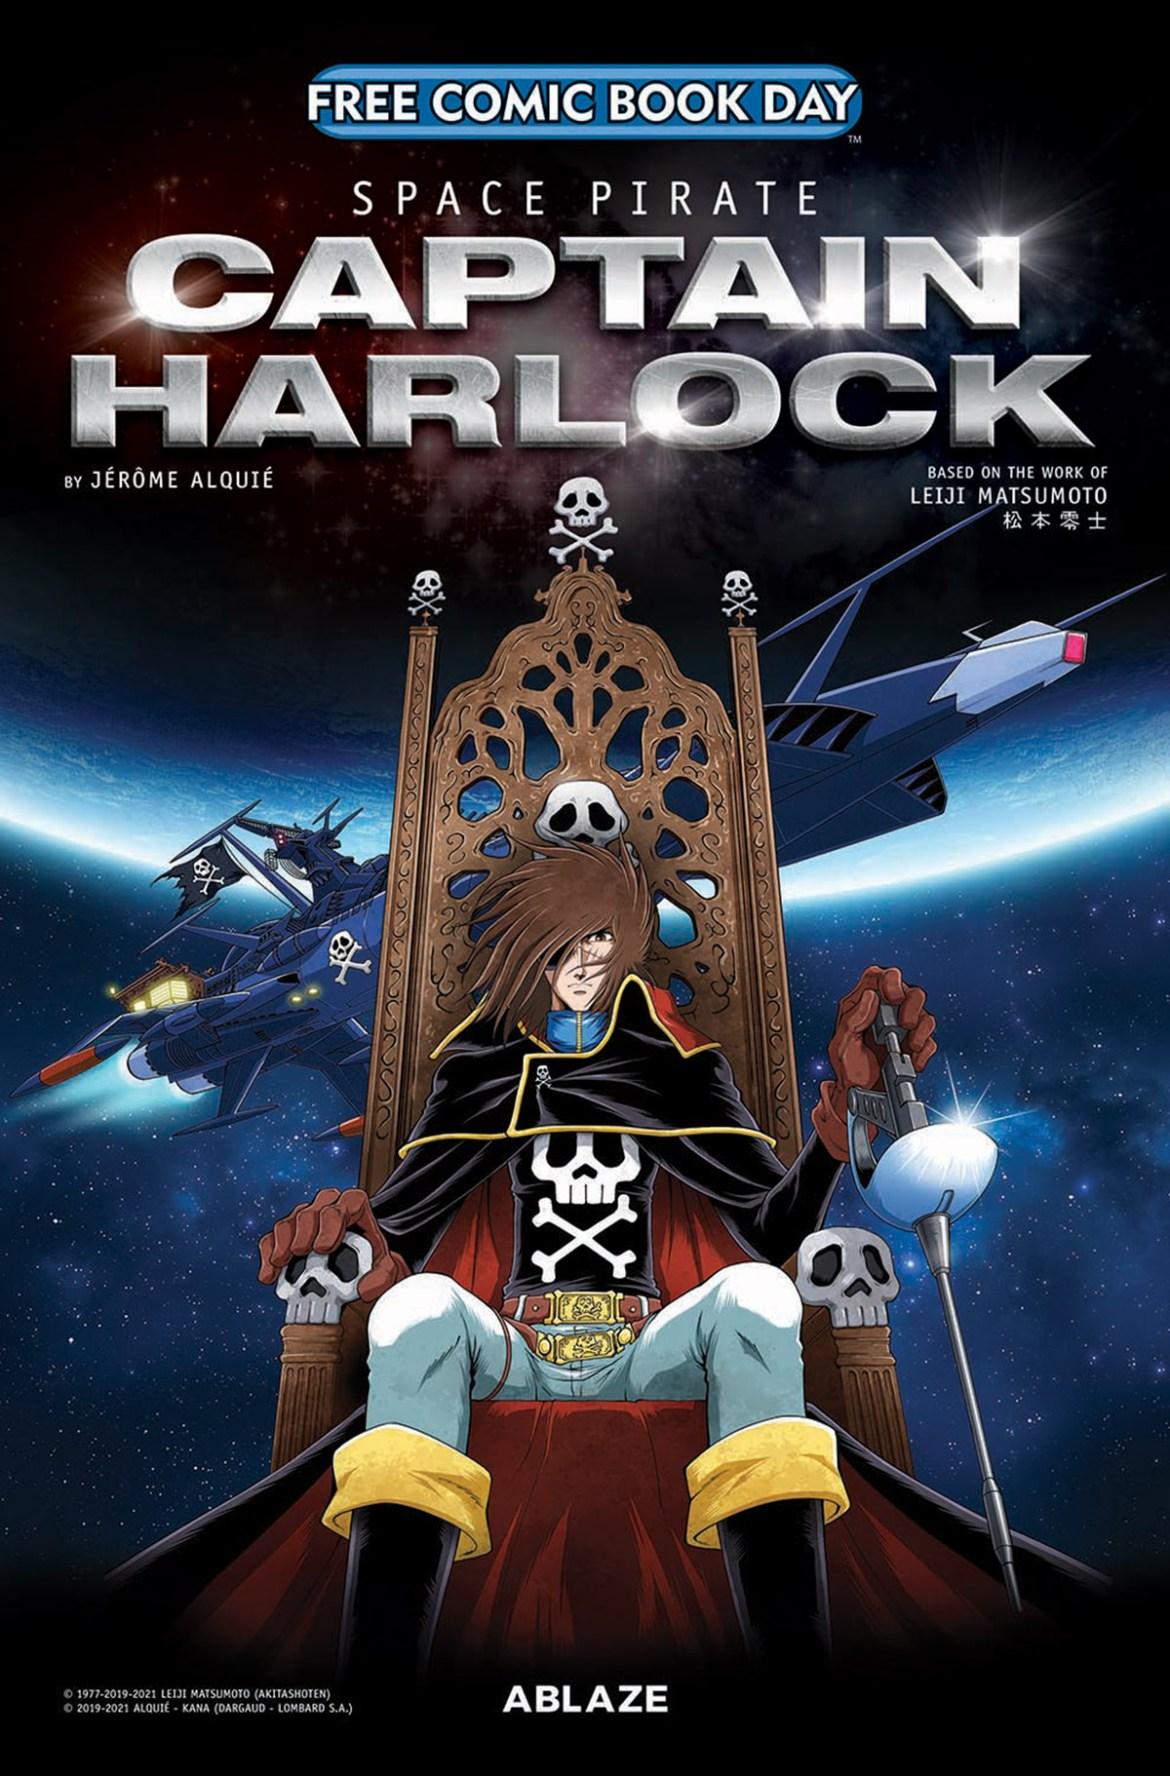 FCBD21_SILVER_ABLAZE_Space-Pirate-Capt-Harlock Complete Free Comic Book Day 2021 comic book line-up announced